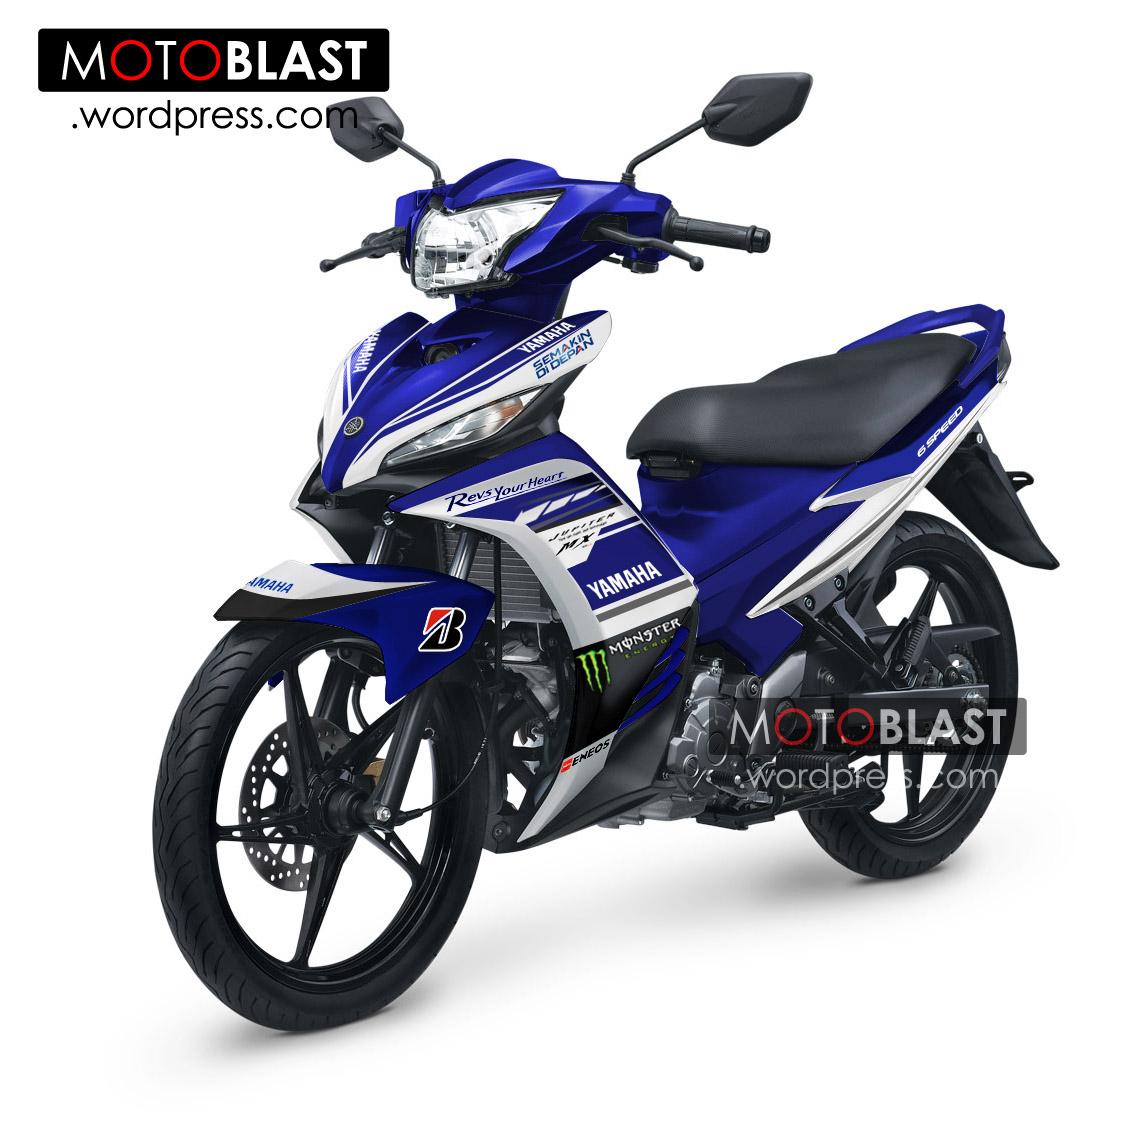 Modif Striping New Jupiter MX Livery motogp 2014! | MOTOBLAST